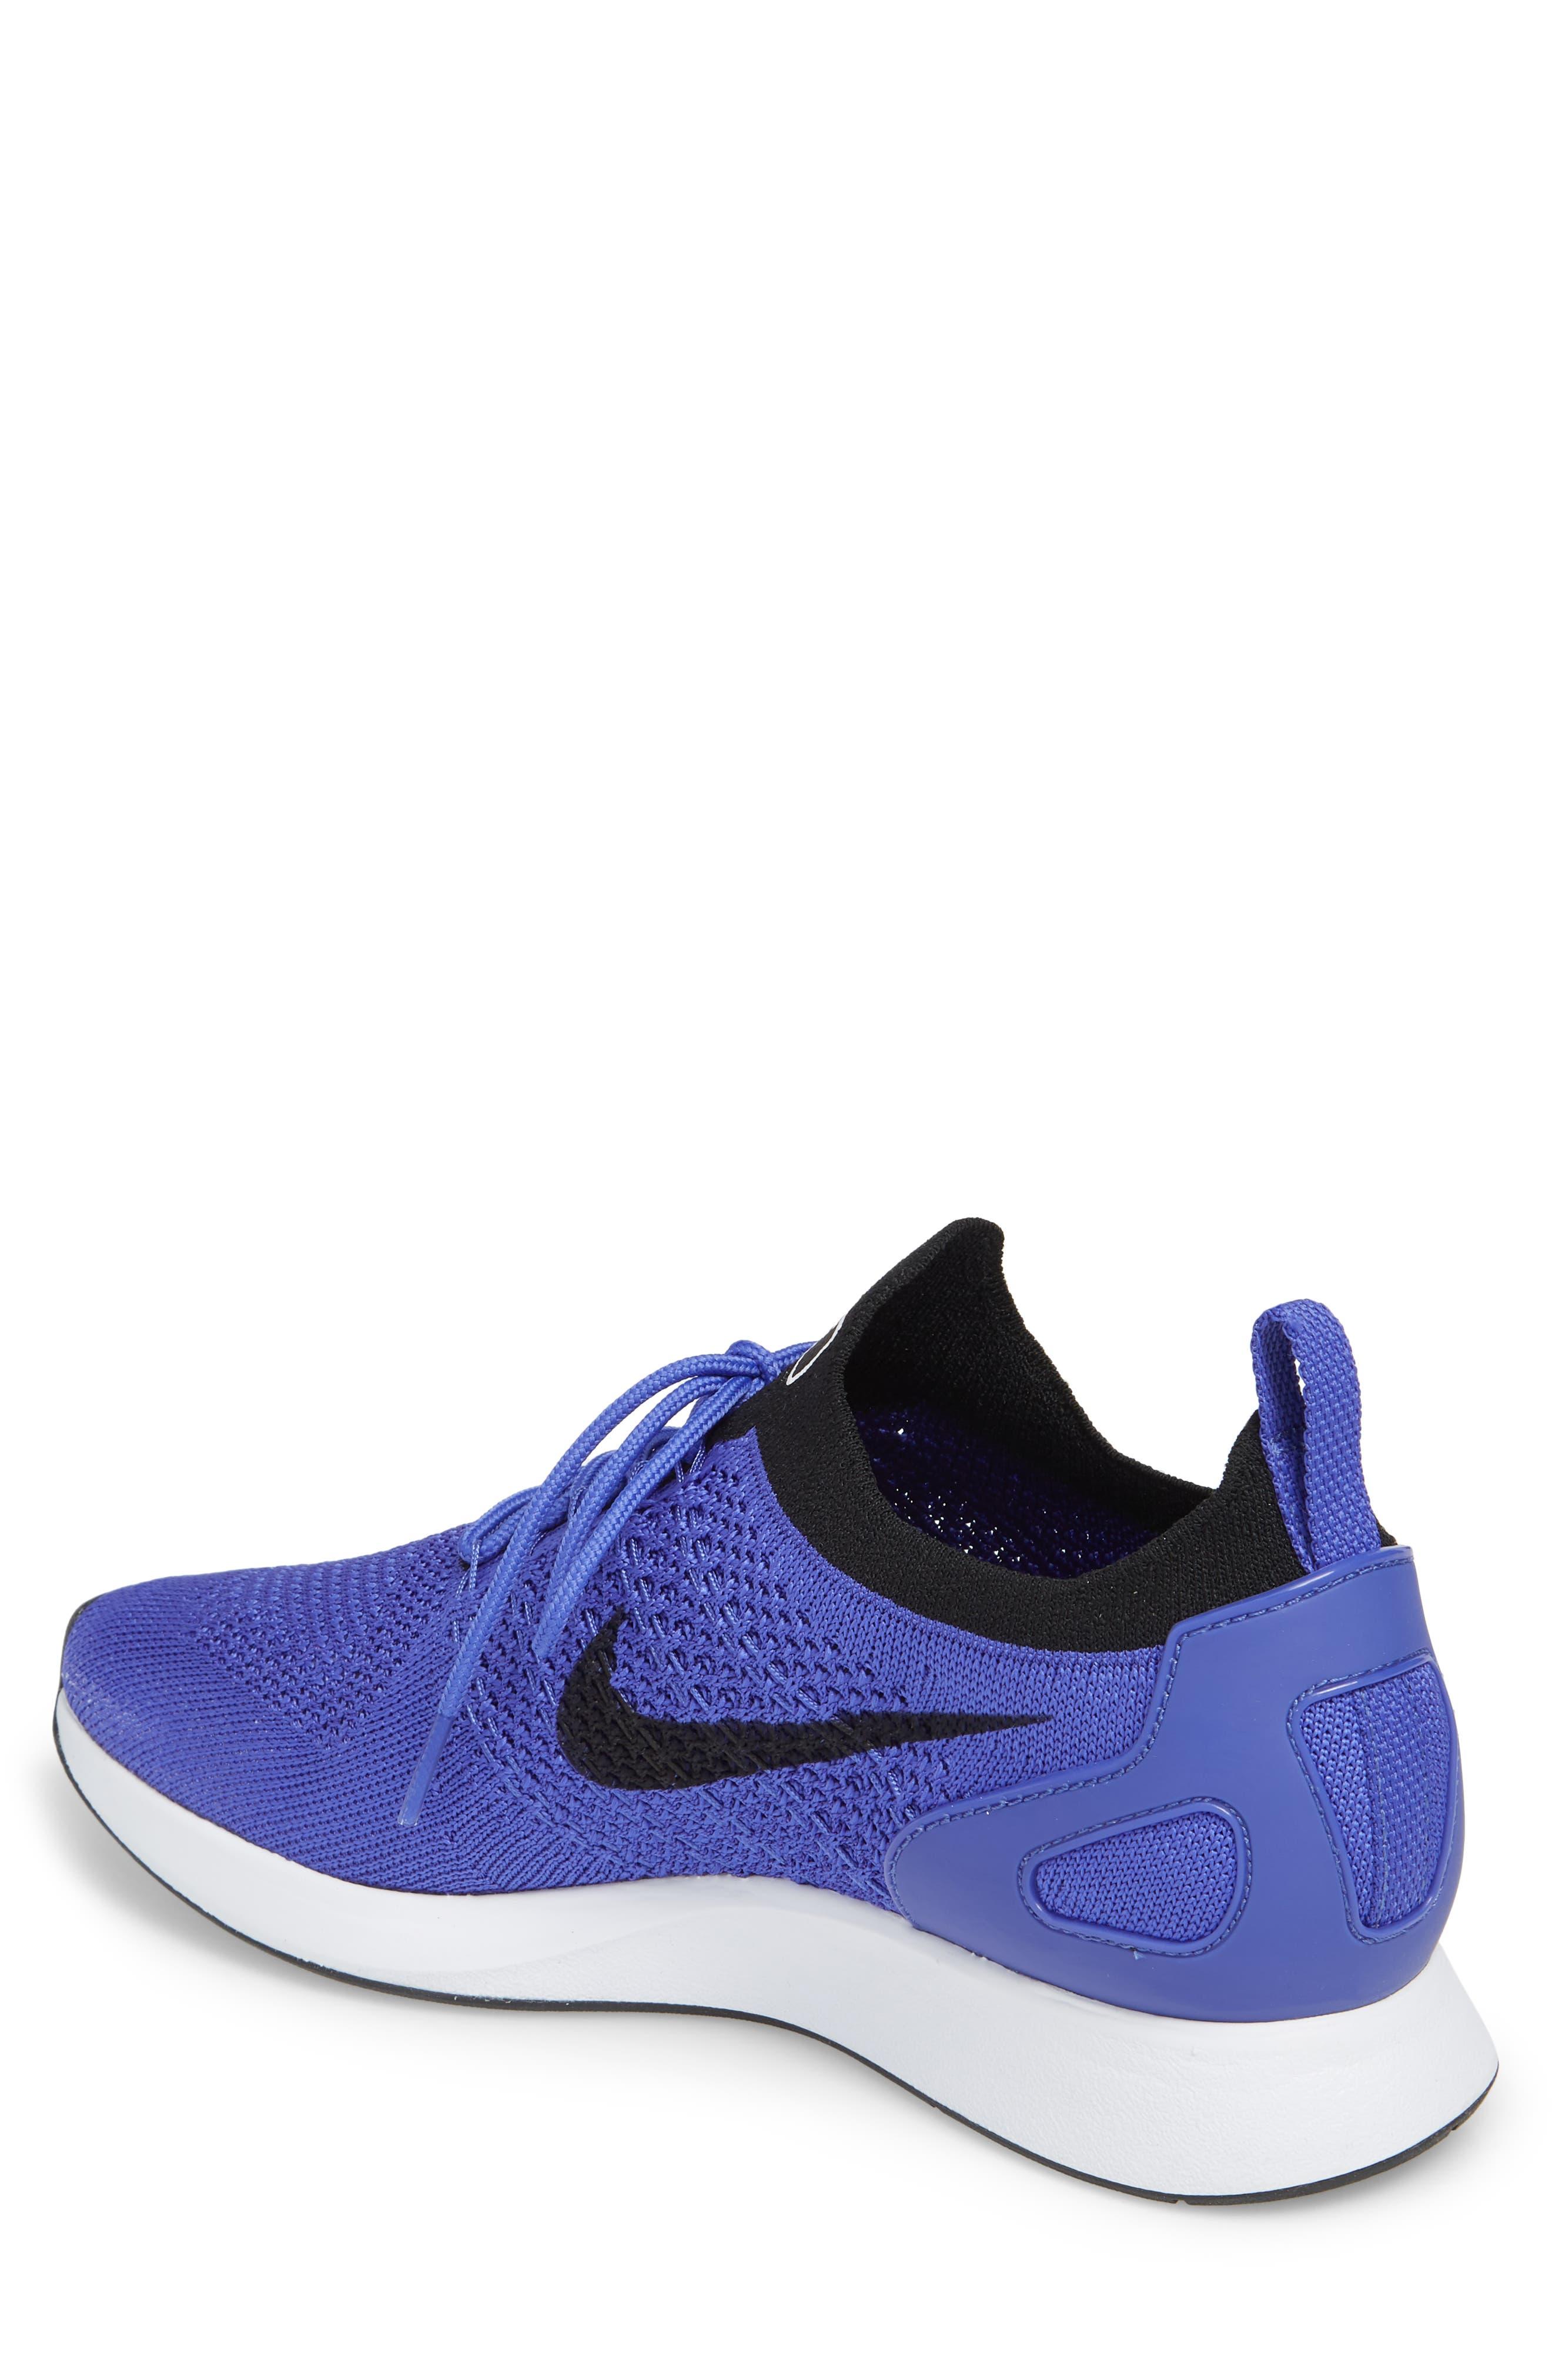 Air Zoom Mariah Flyknit Racer Sneaker,                             Alternate thumbnail 2, color,                             VIOLET/ BLACK/ WHITE